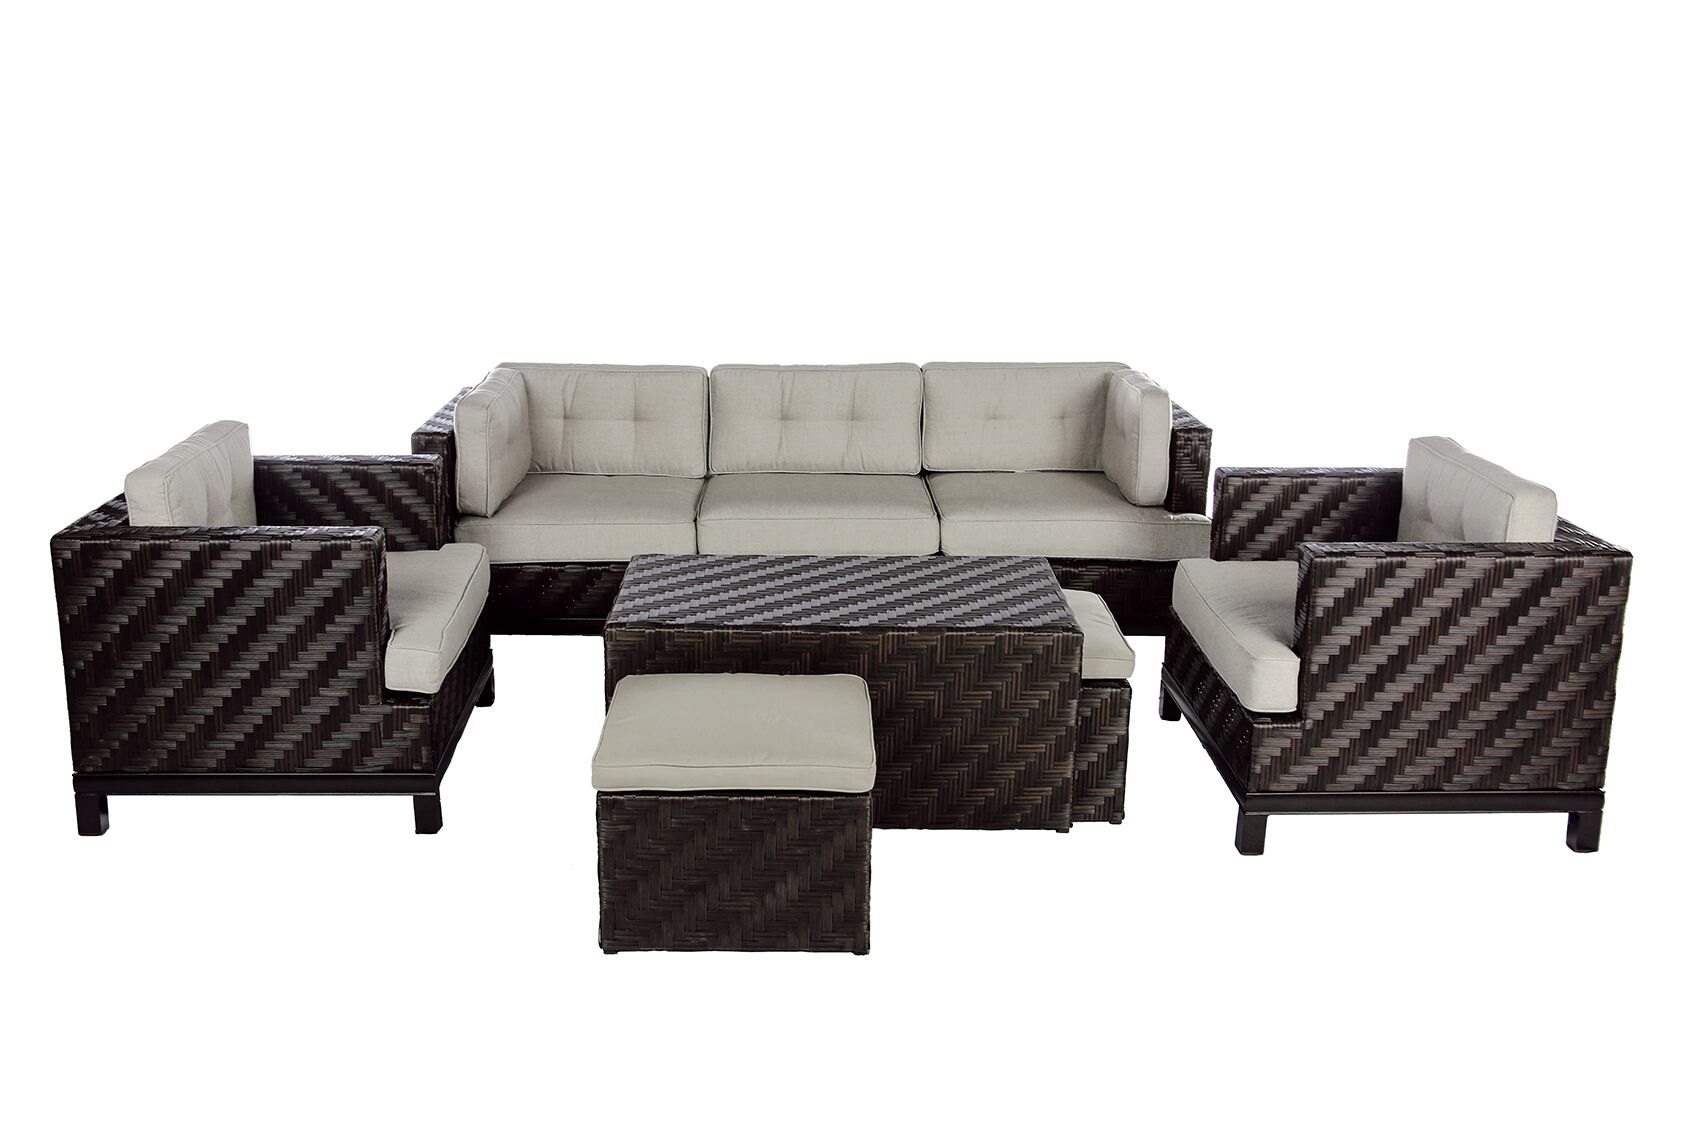 Laforce 8 Piece Sunbrella Sofa Set with Cushions Color: Cast Ash